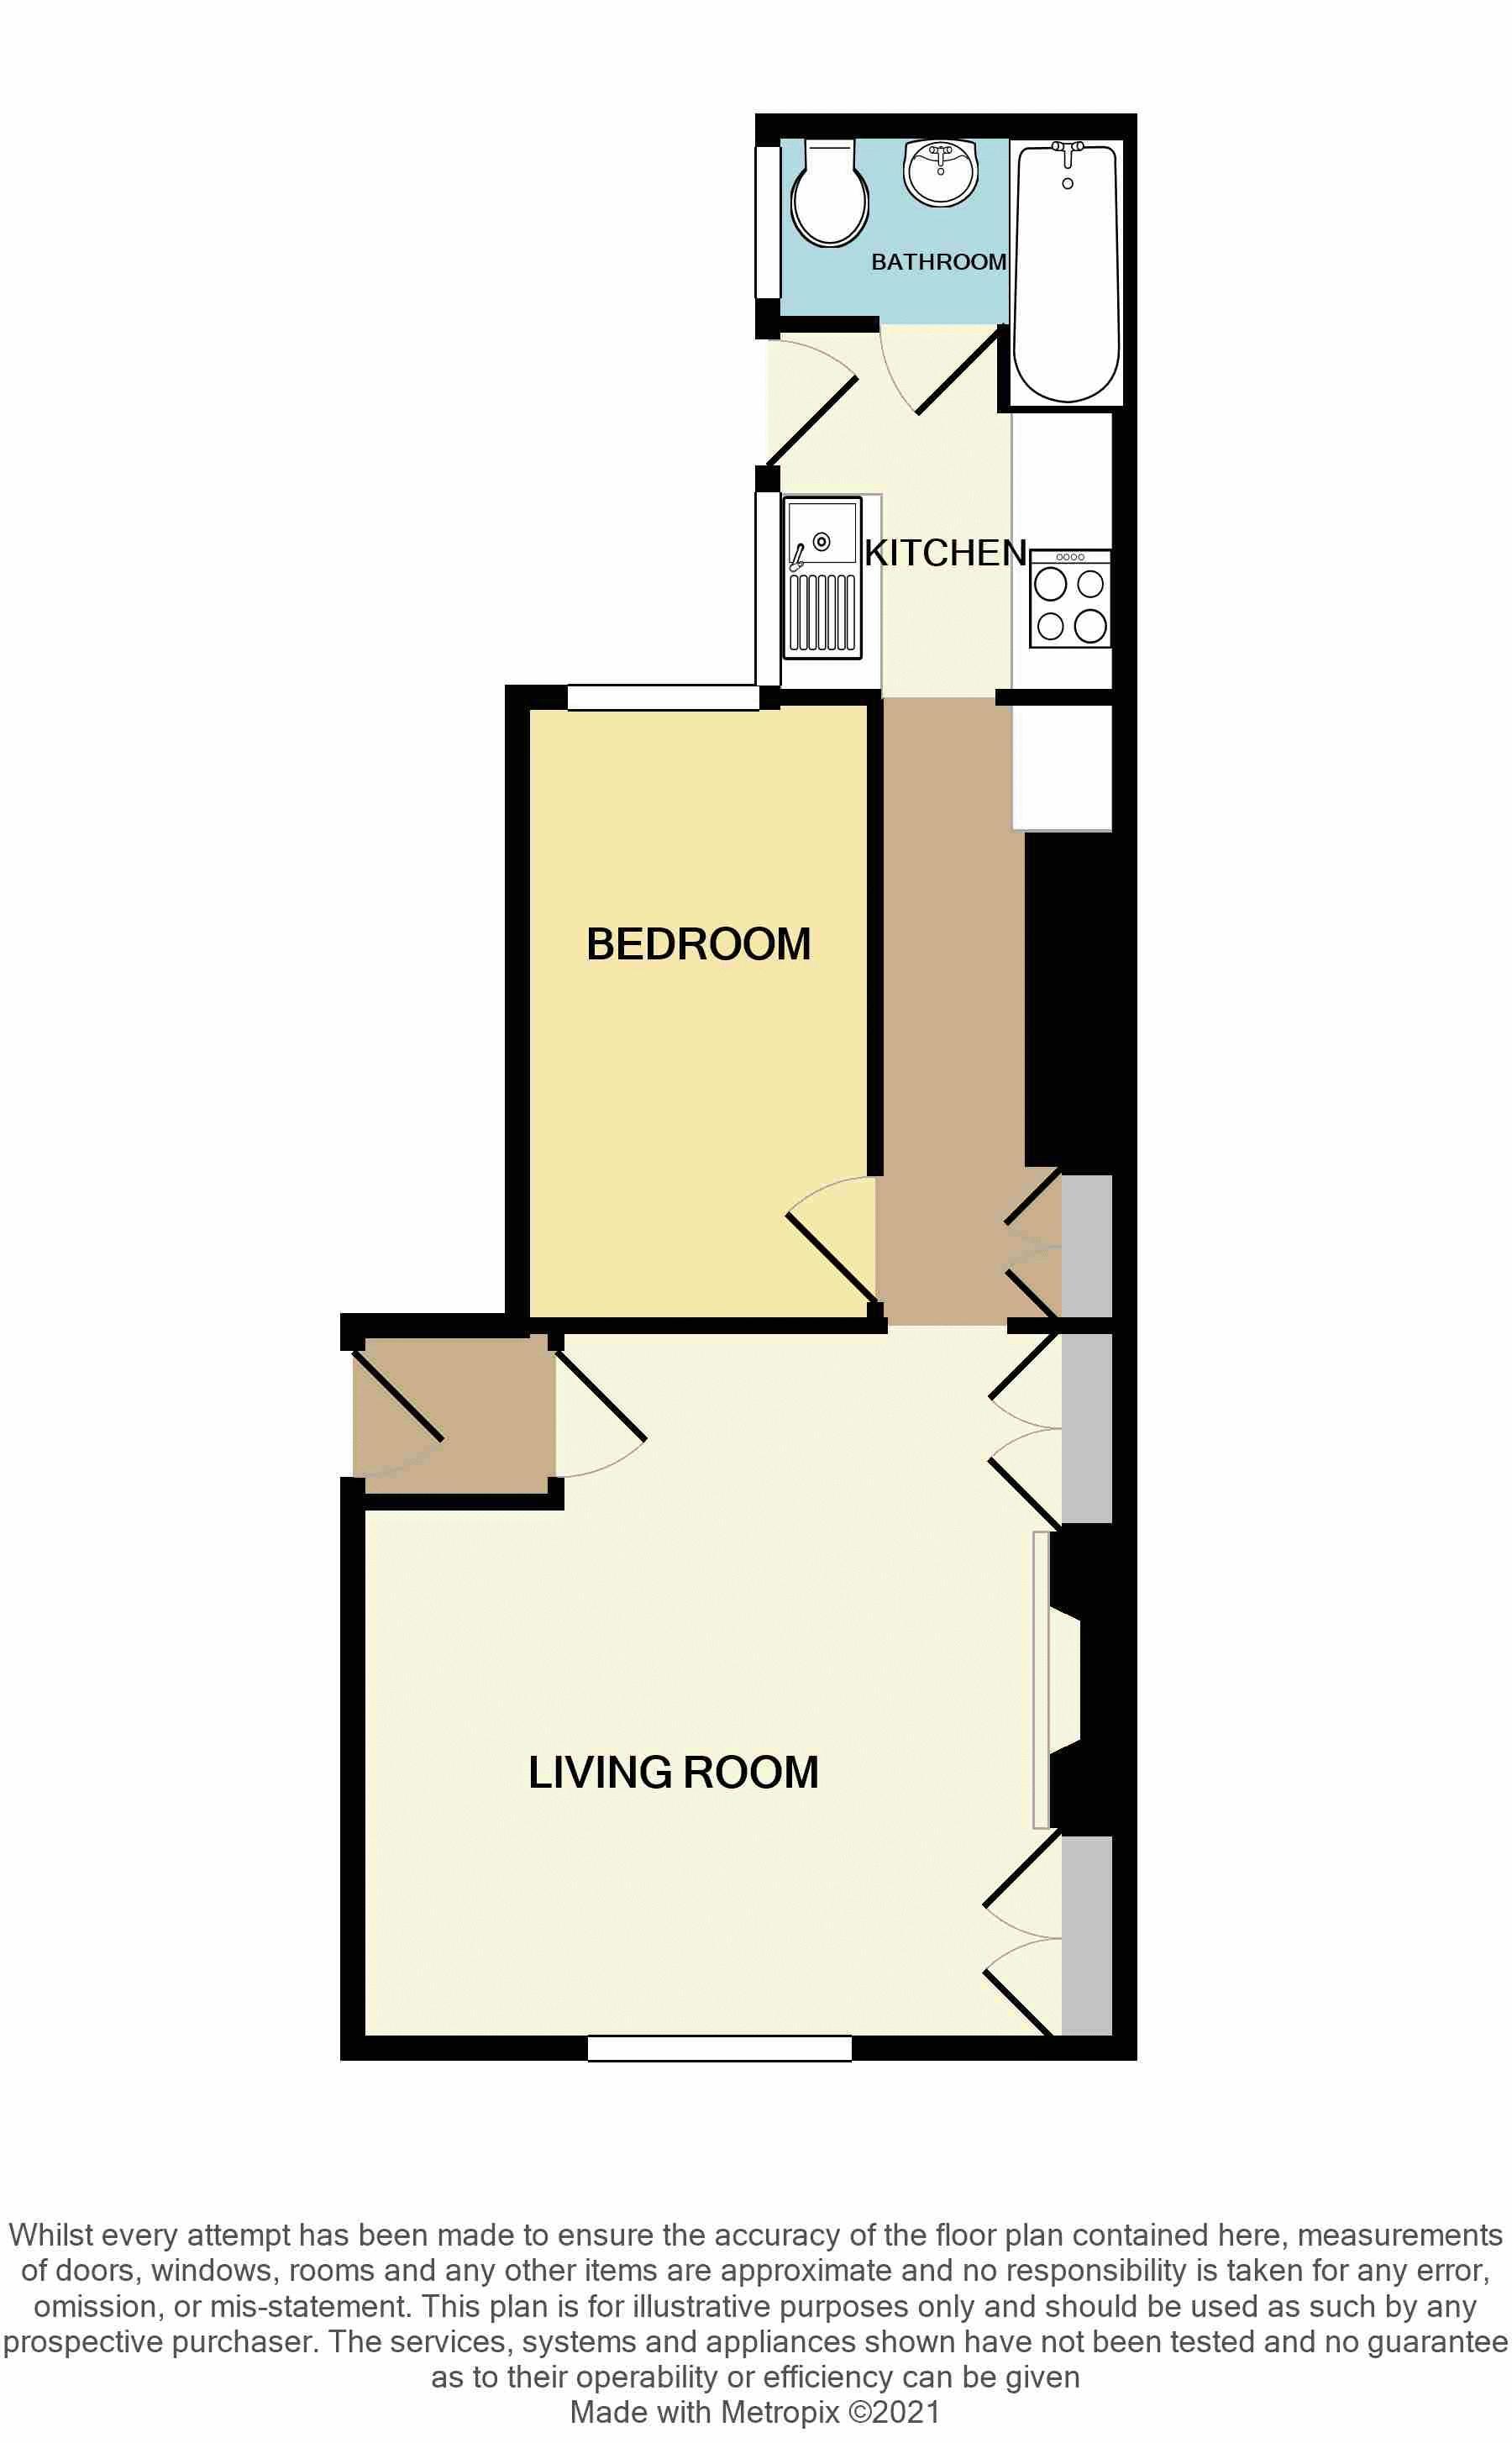 Belmont Road, Exeter floorplan